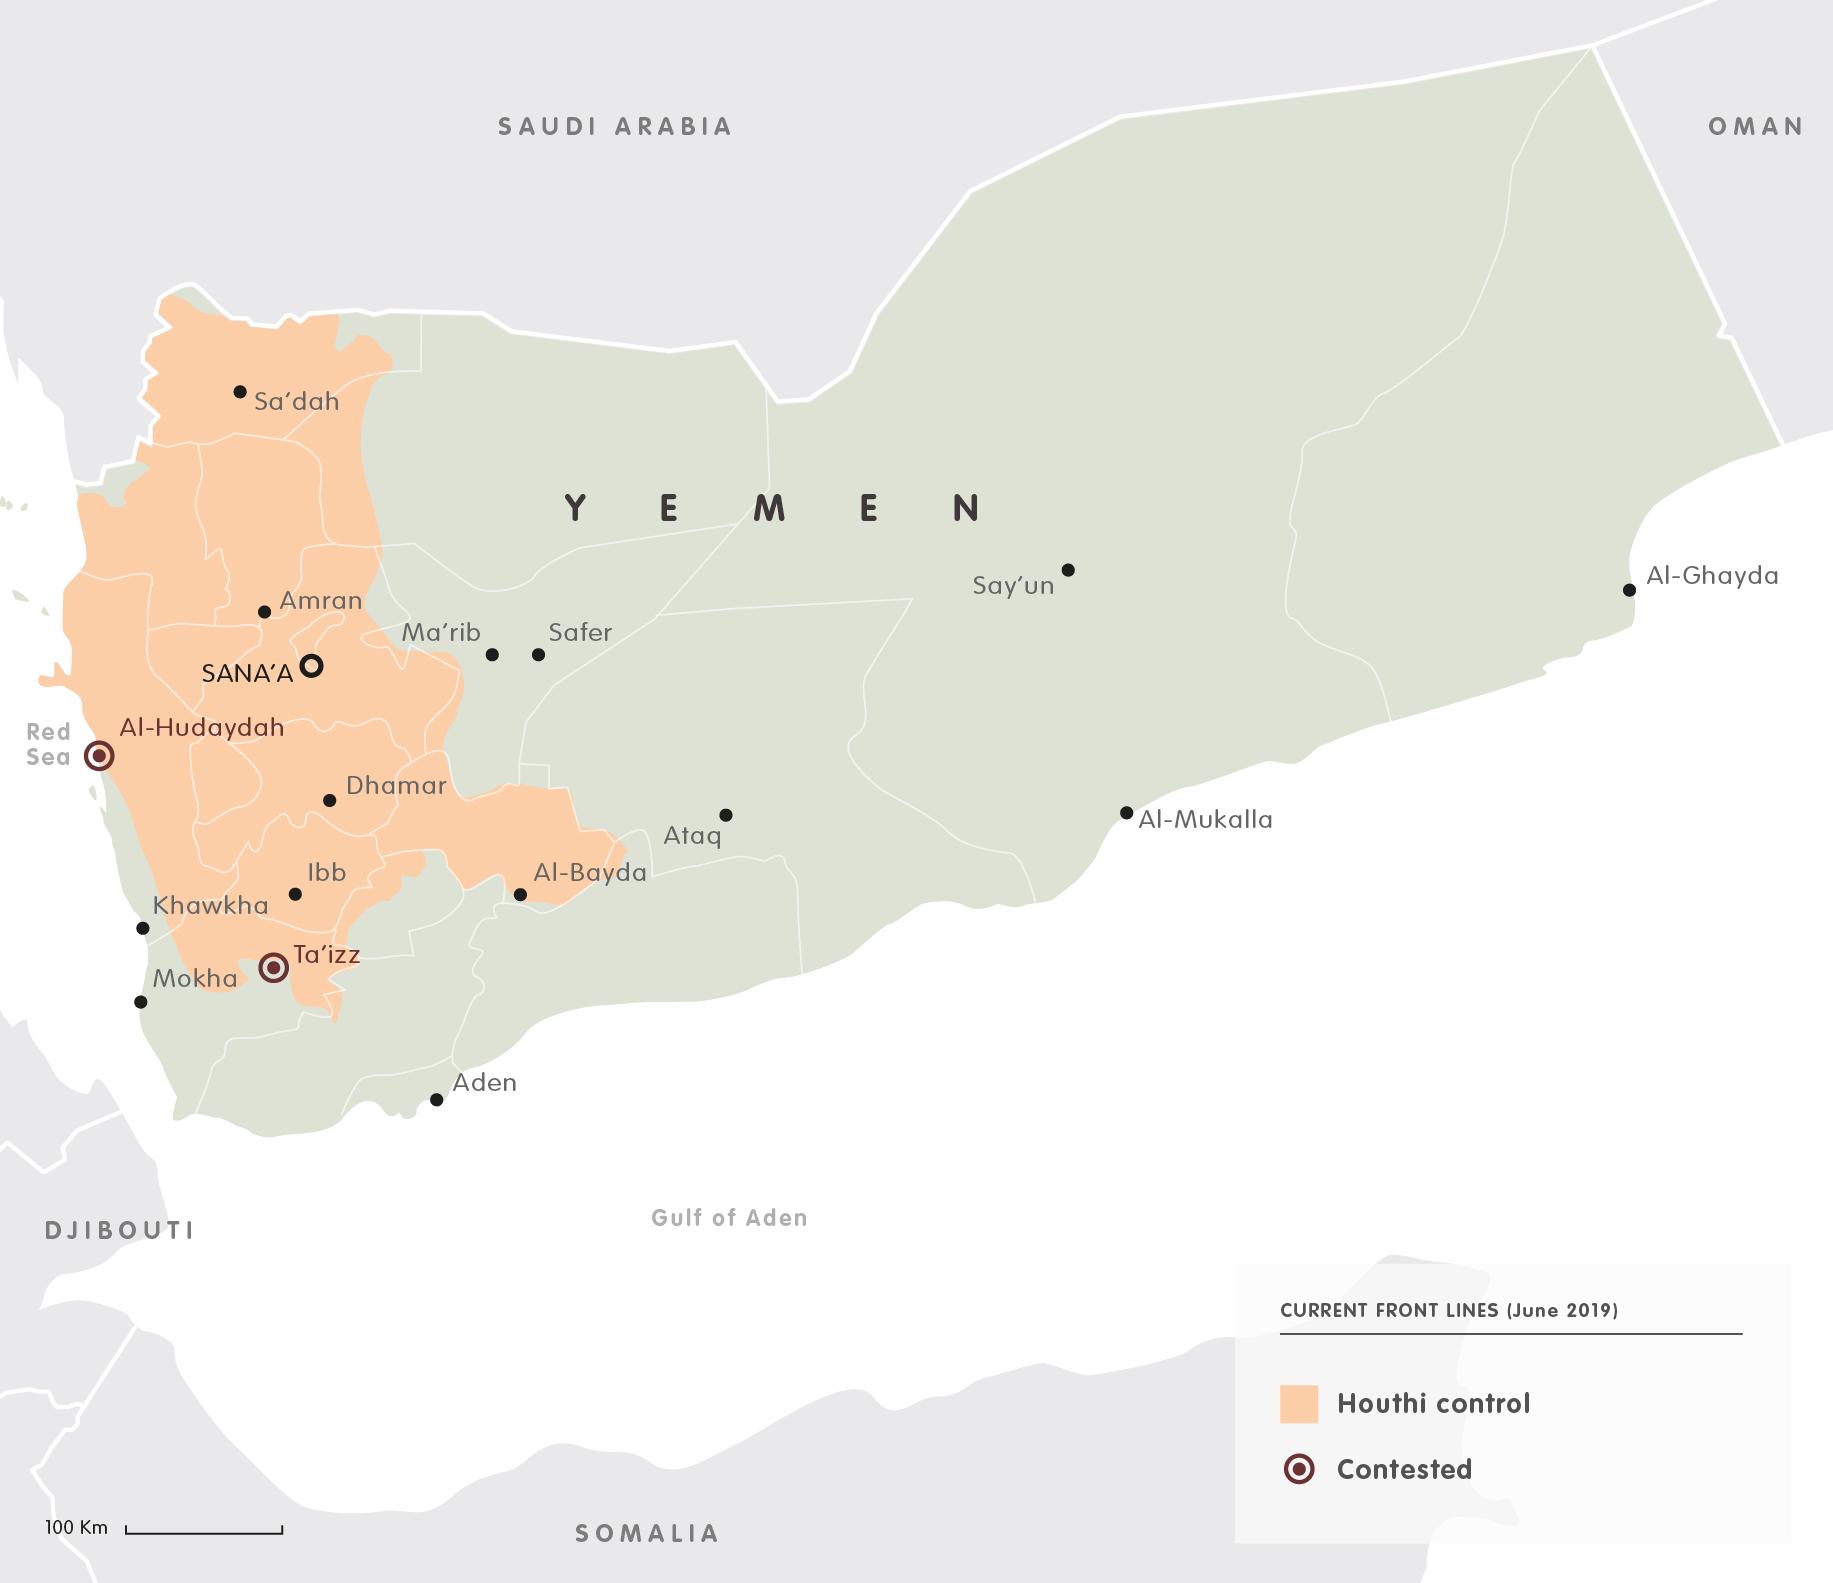 Yemen frontolines 2019